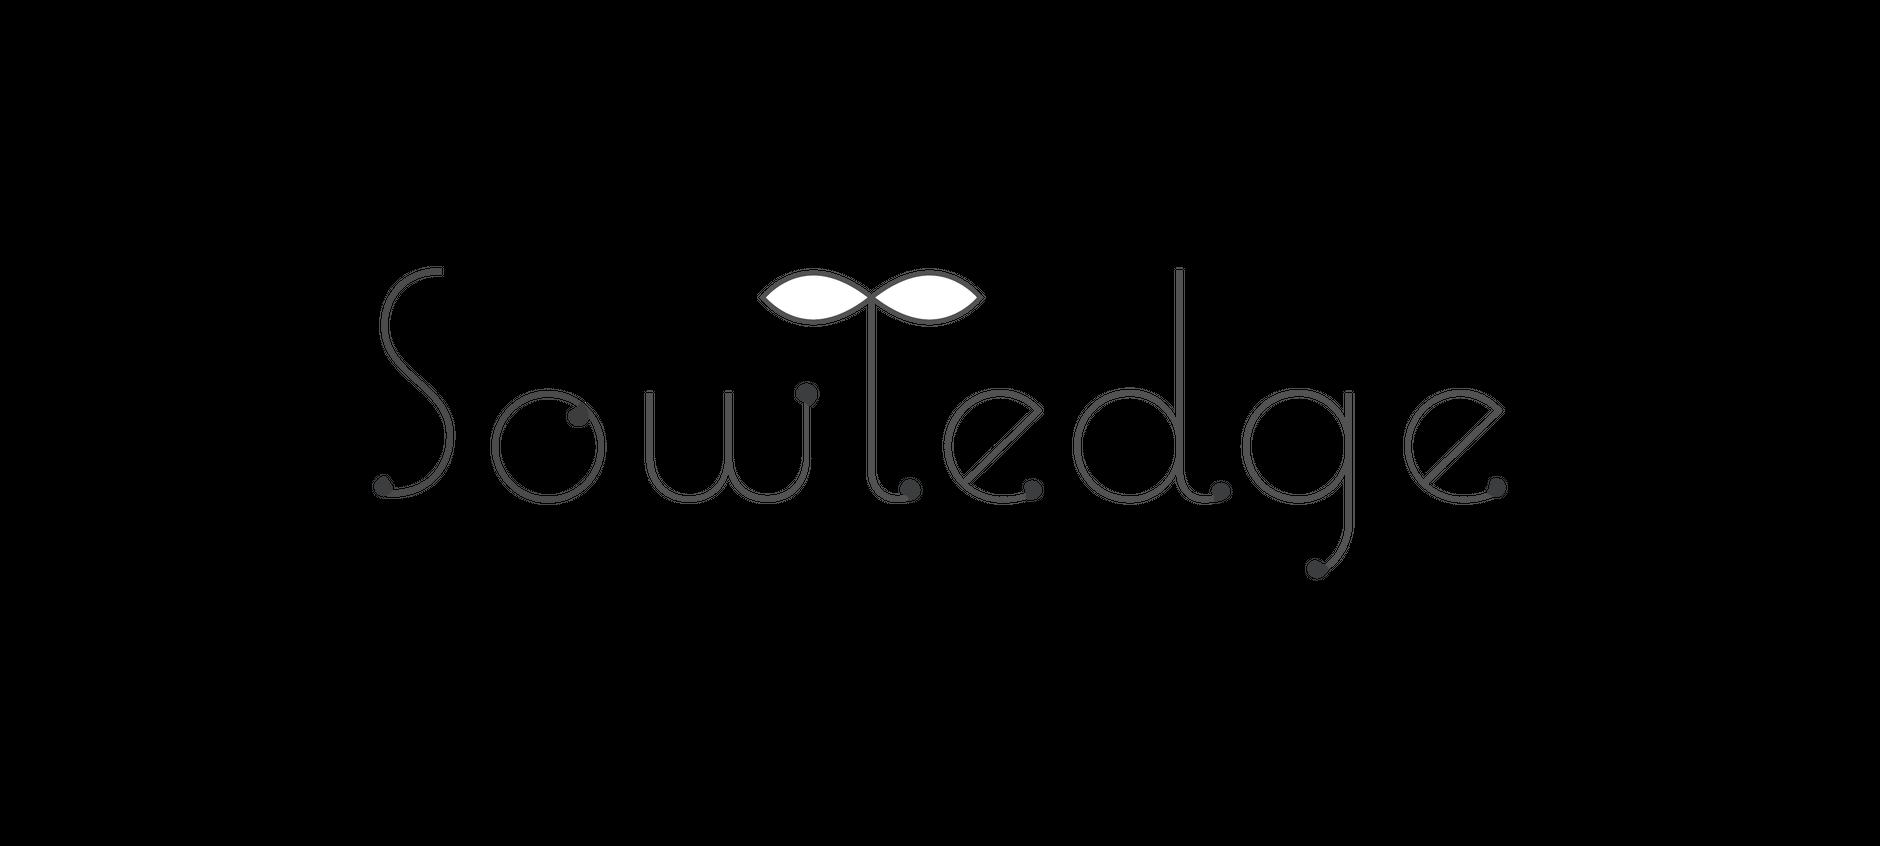 Sowledge